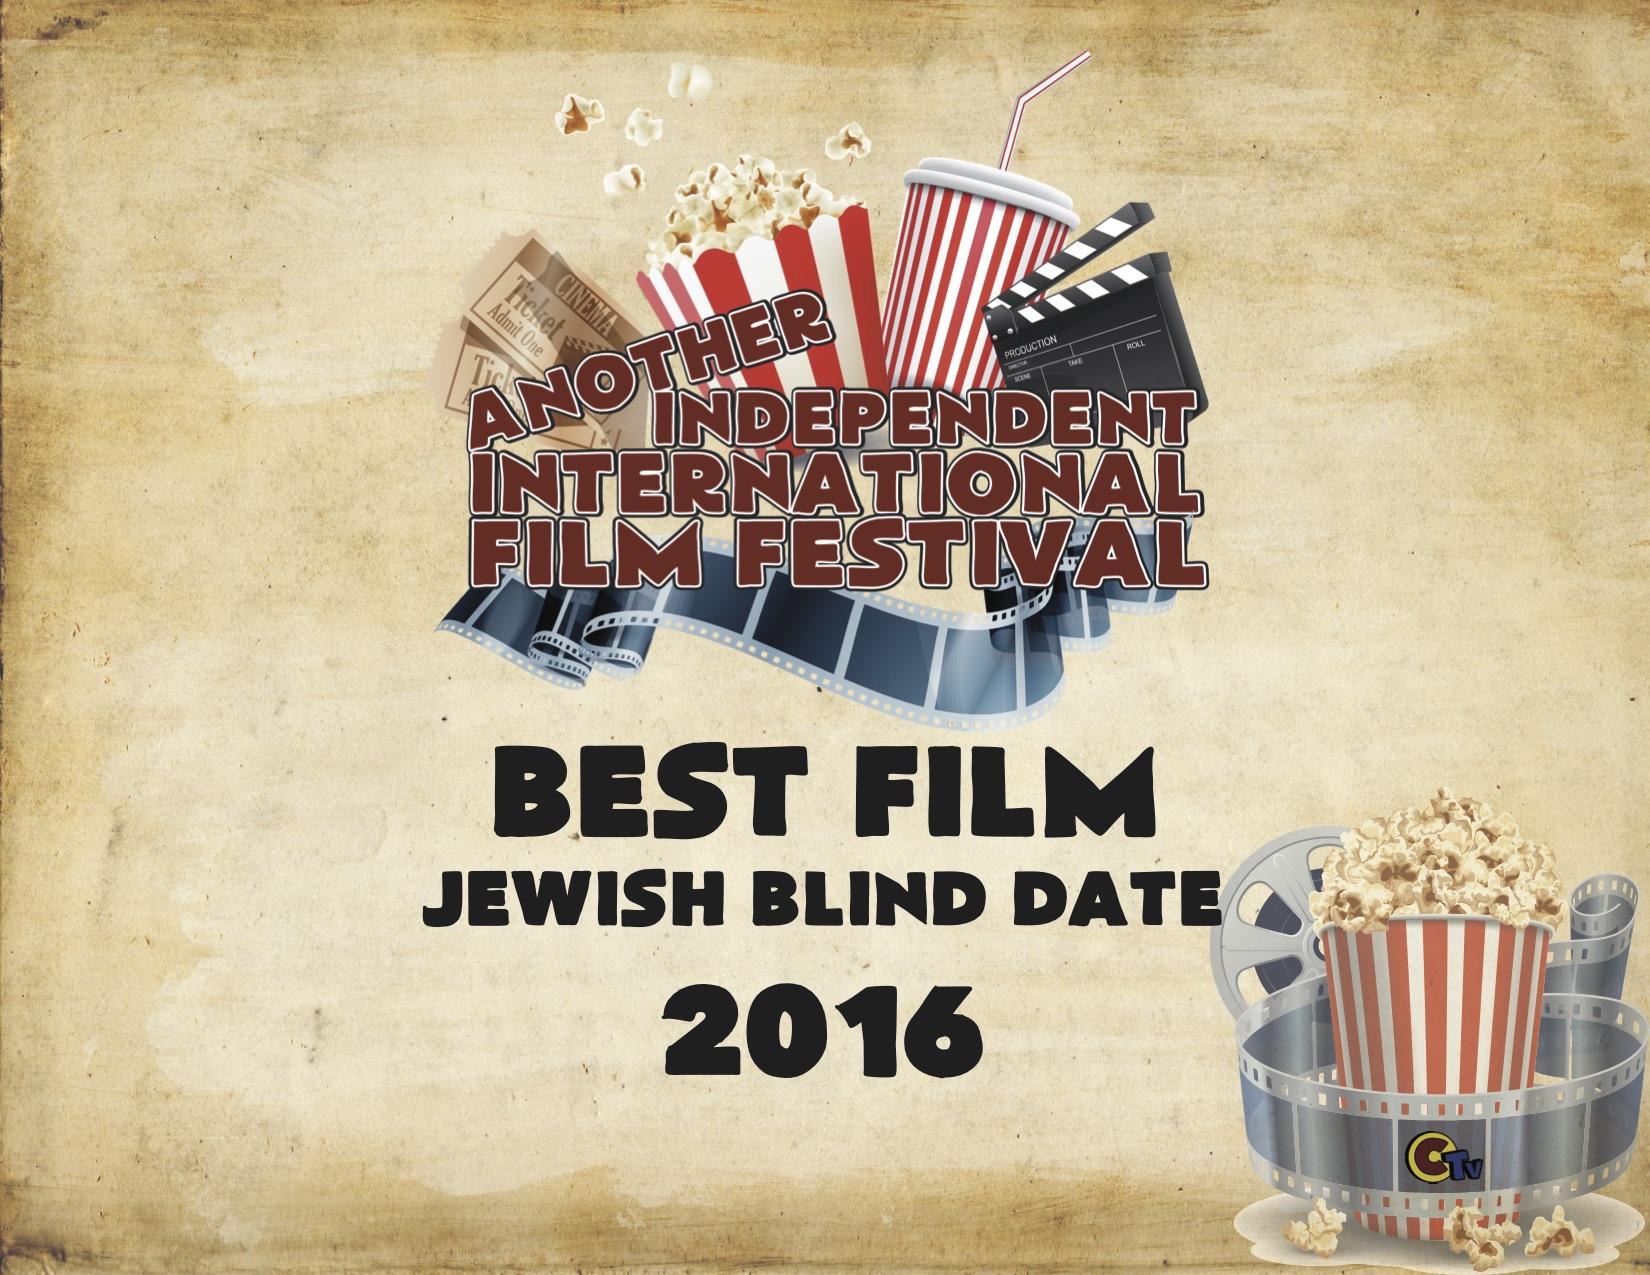 AIIFF2016-BestFilm-JewishBlindDate